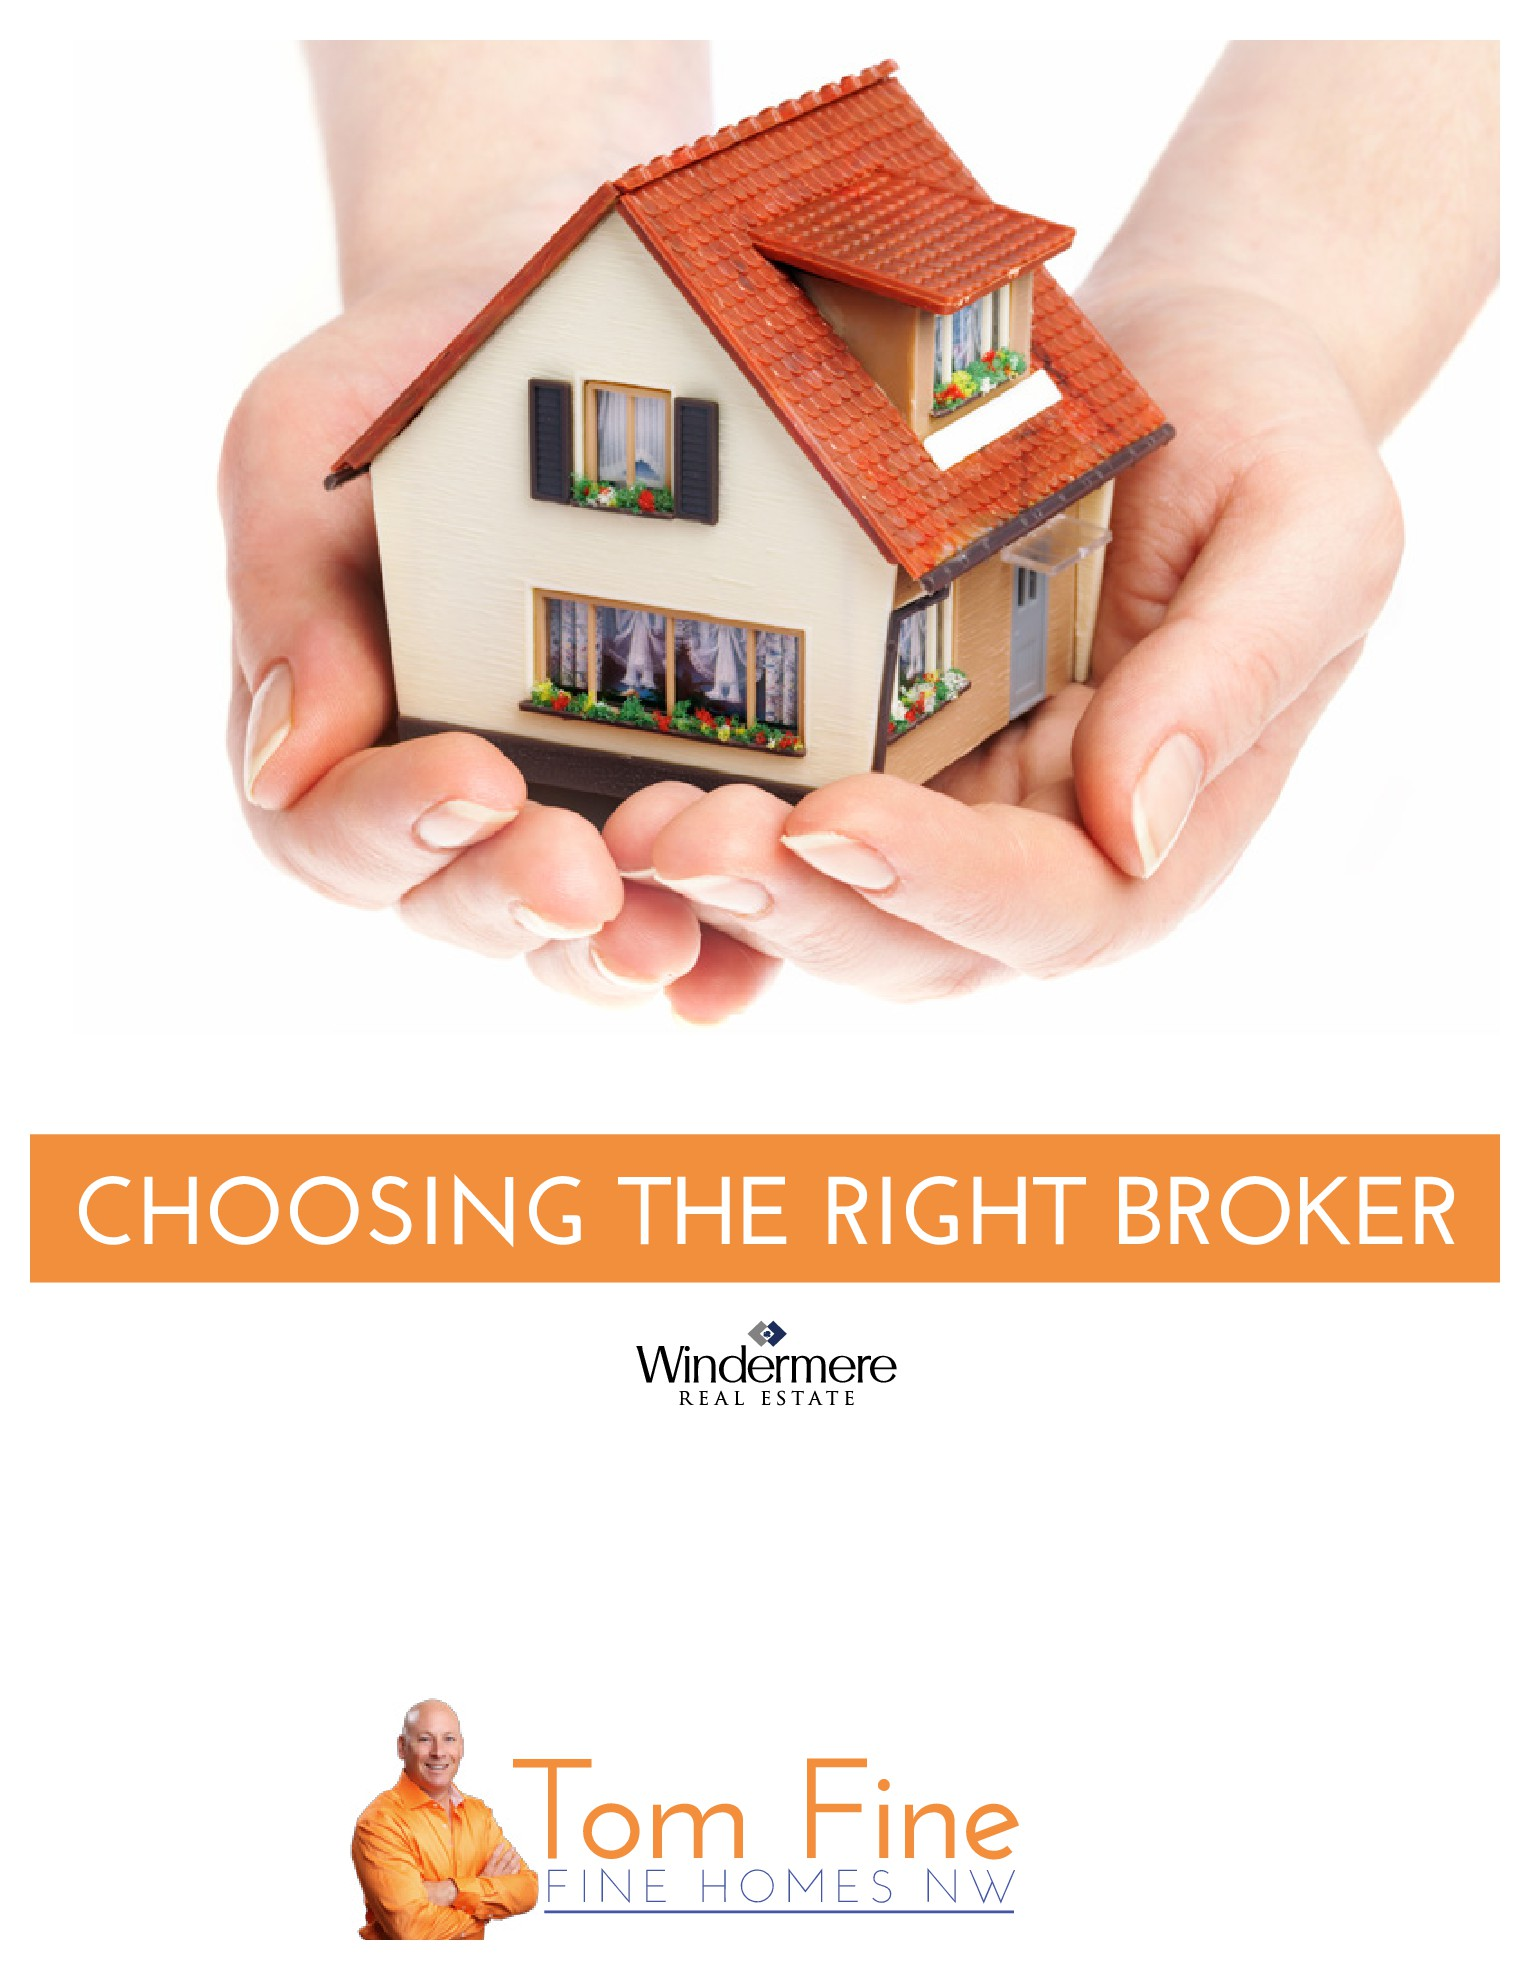 Choosing a Broker Page 1